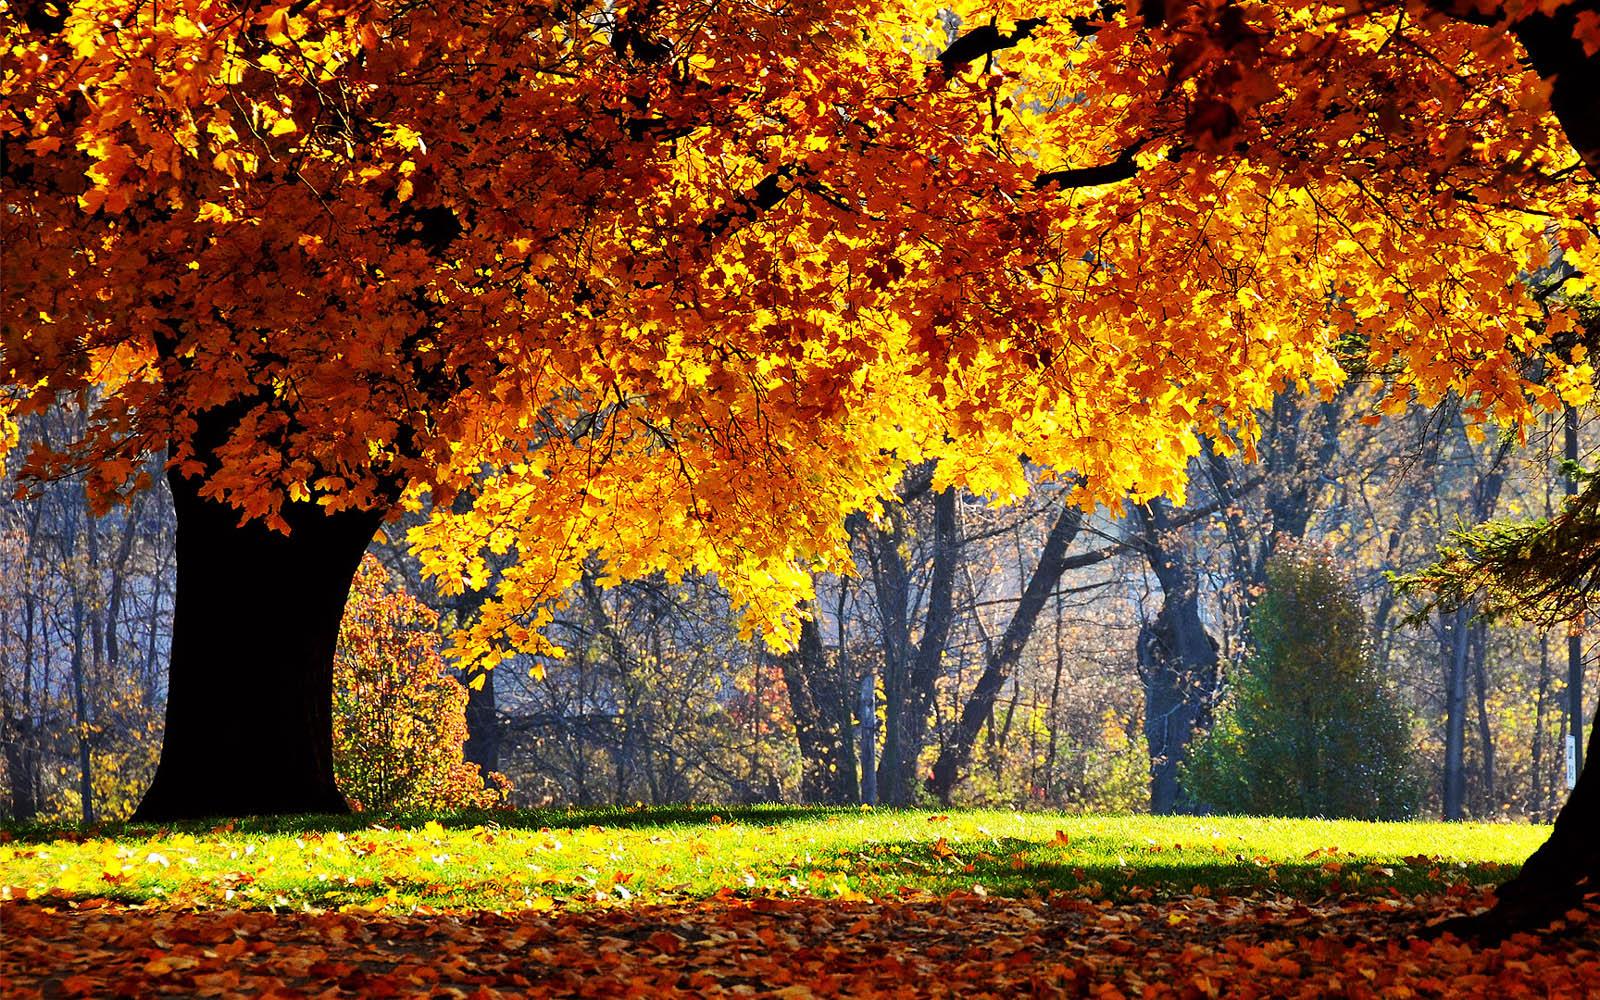 XS Wallpapers HD: Beautiful Autumn Scenery Wallpapers